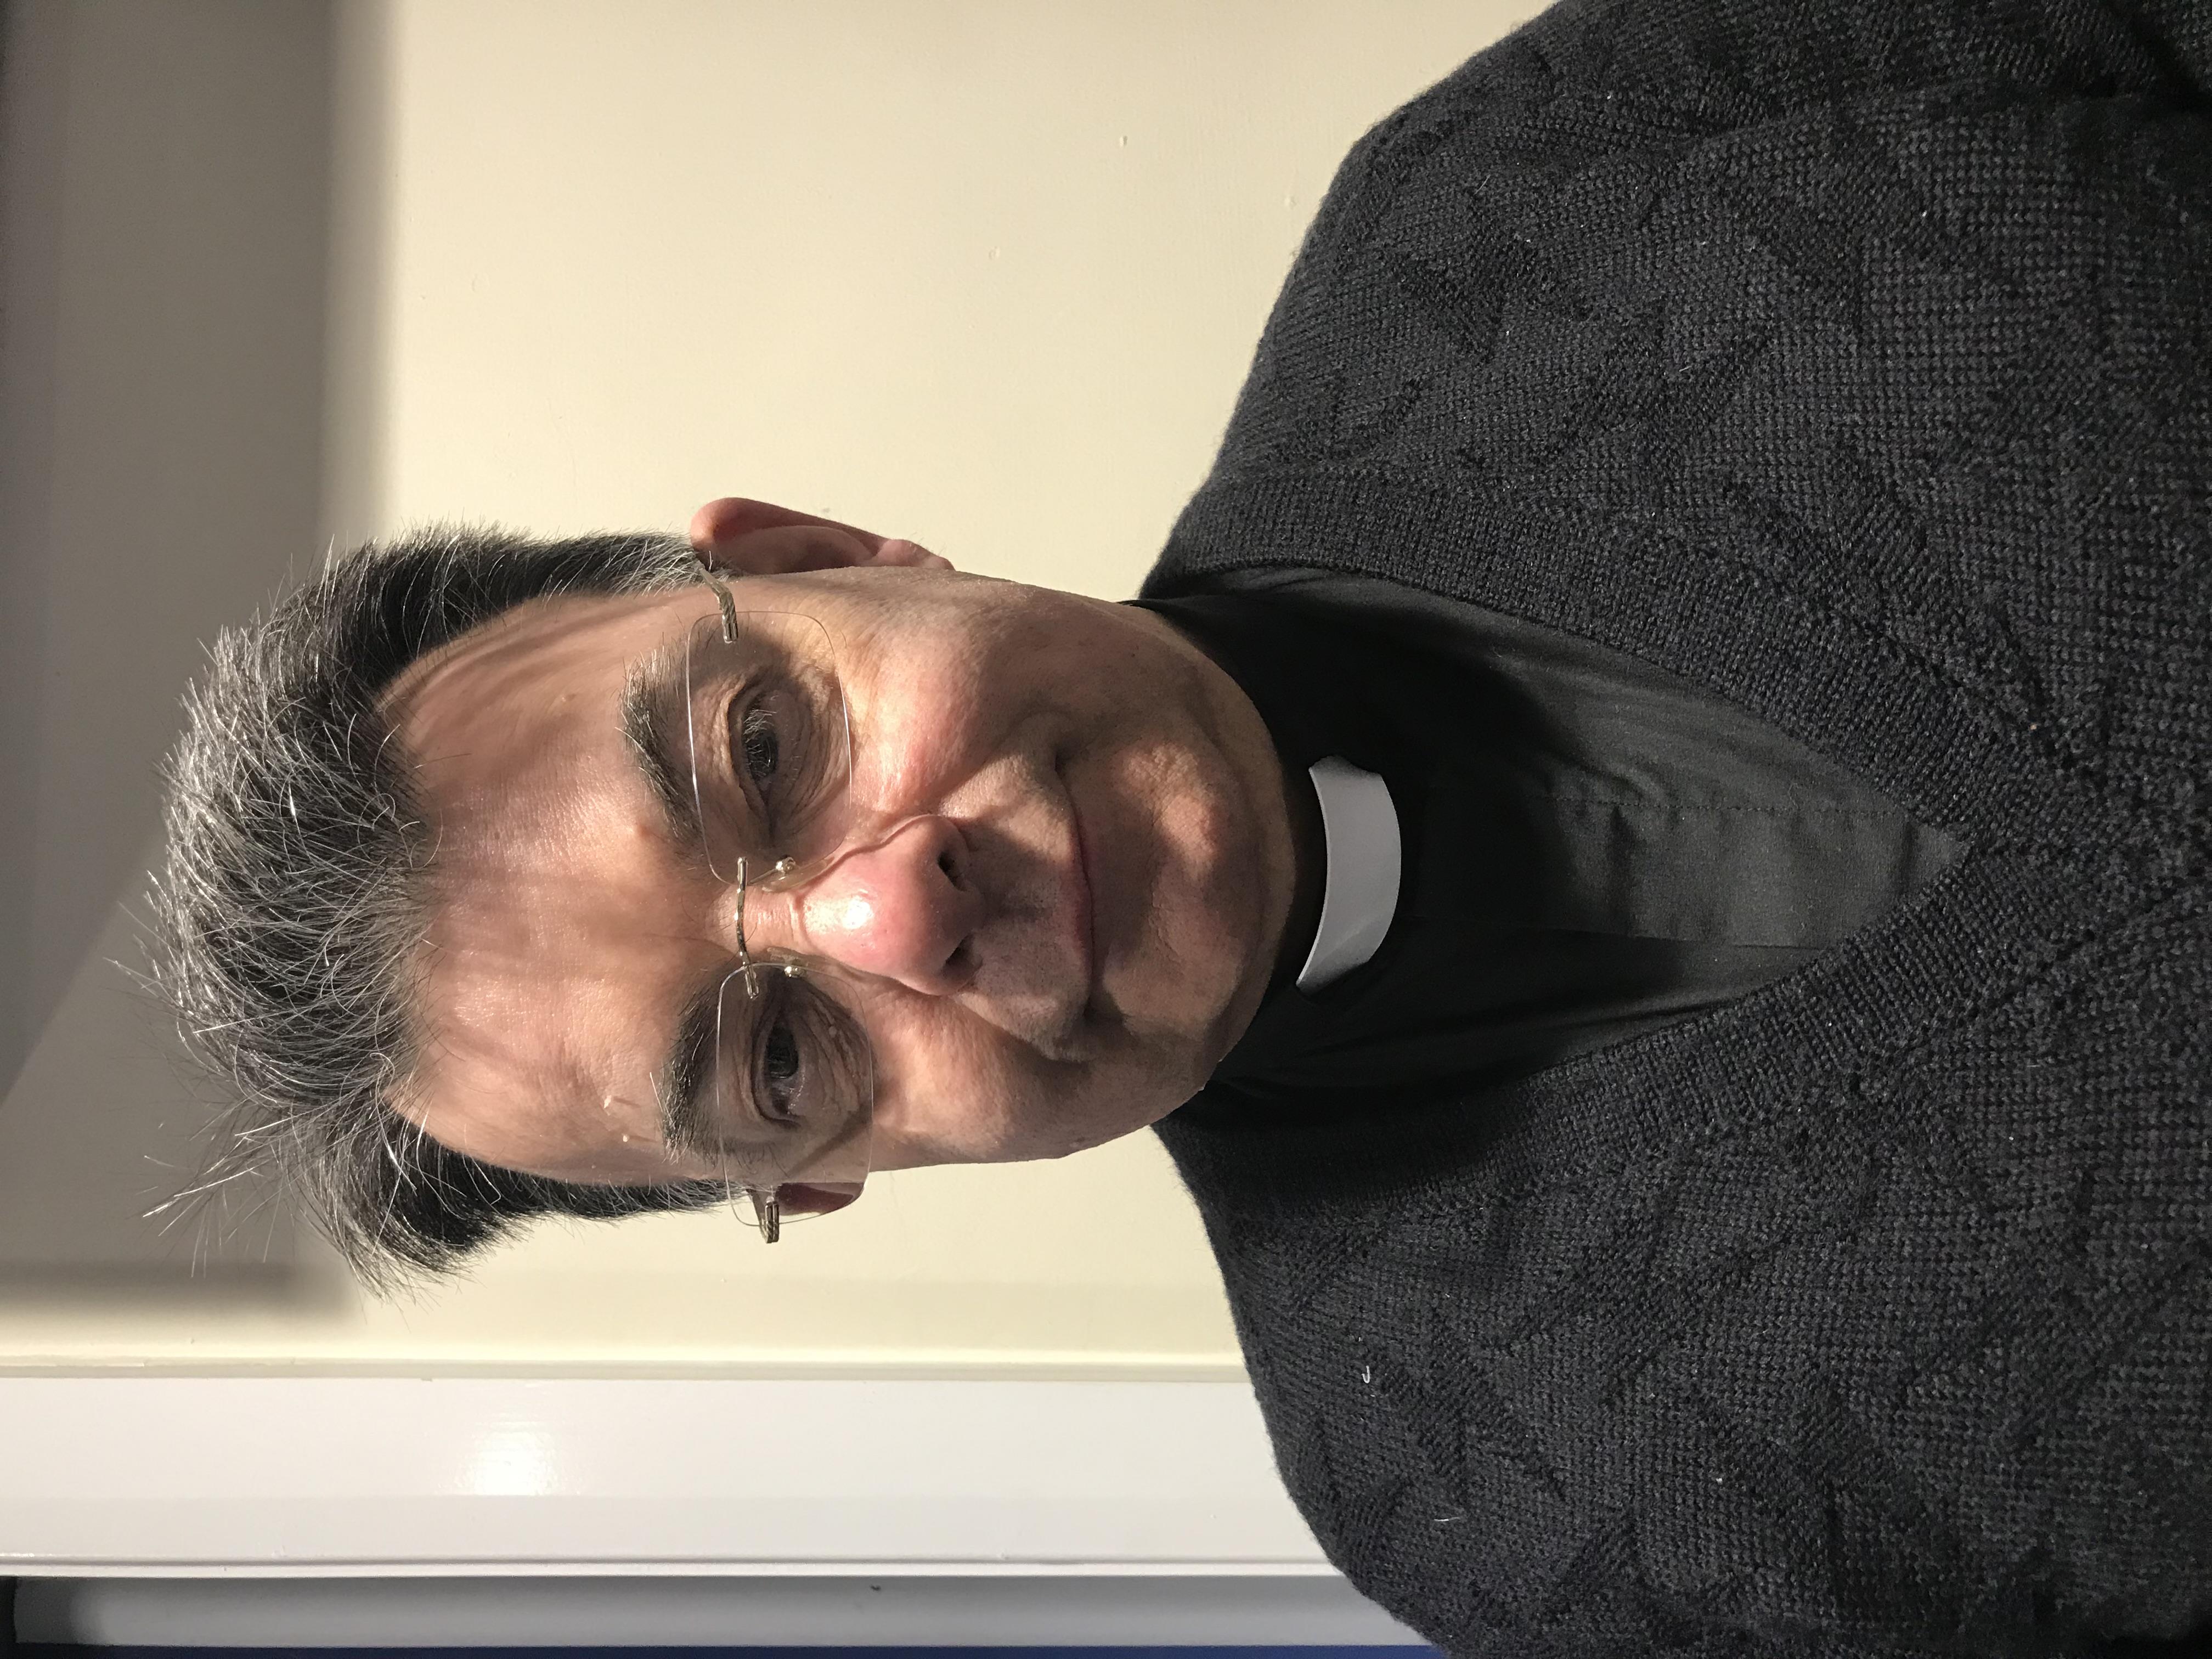 Fr Frank Thorpe